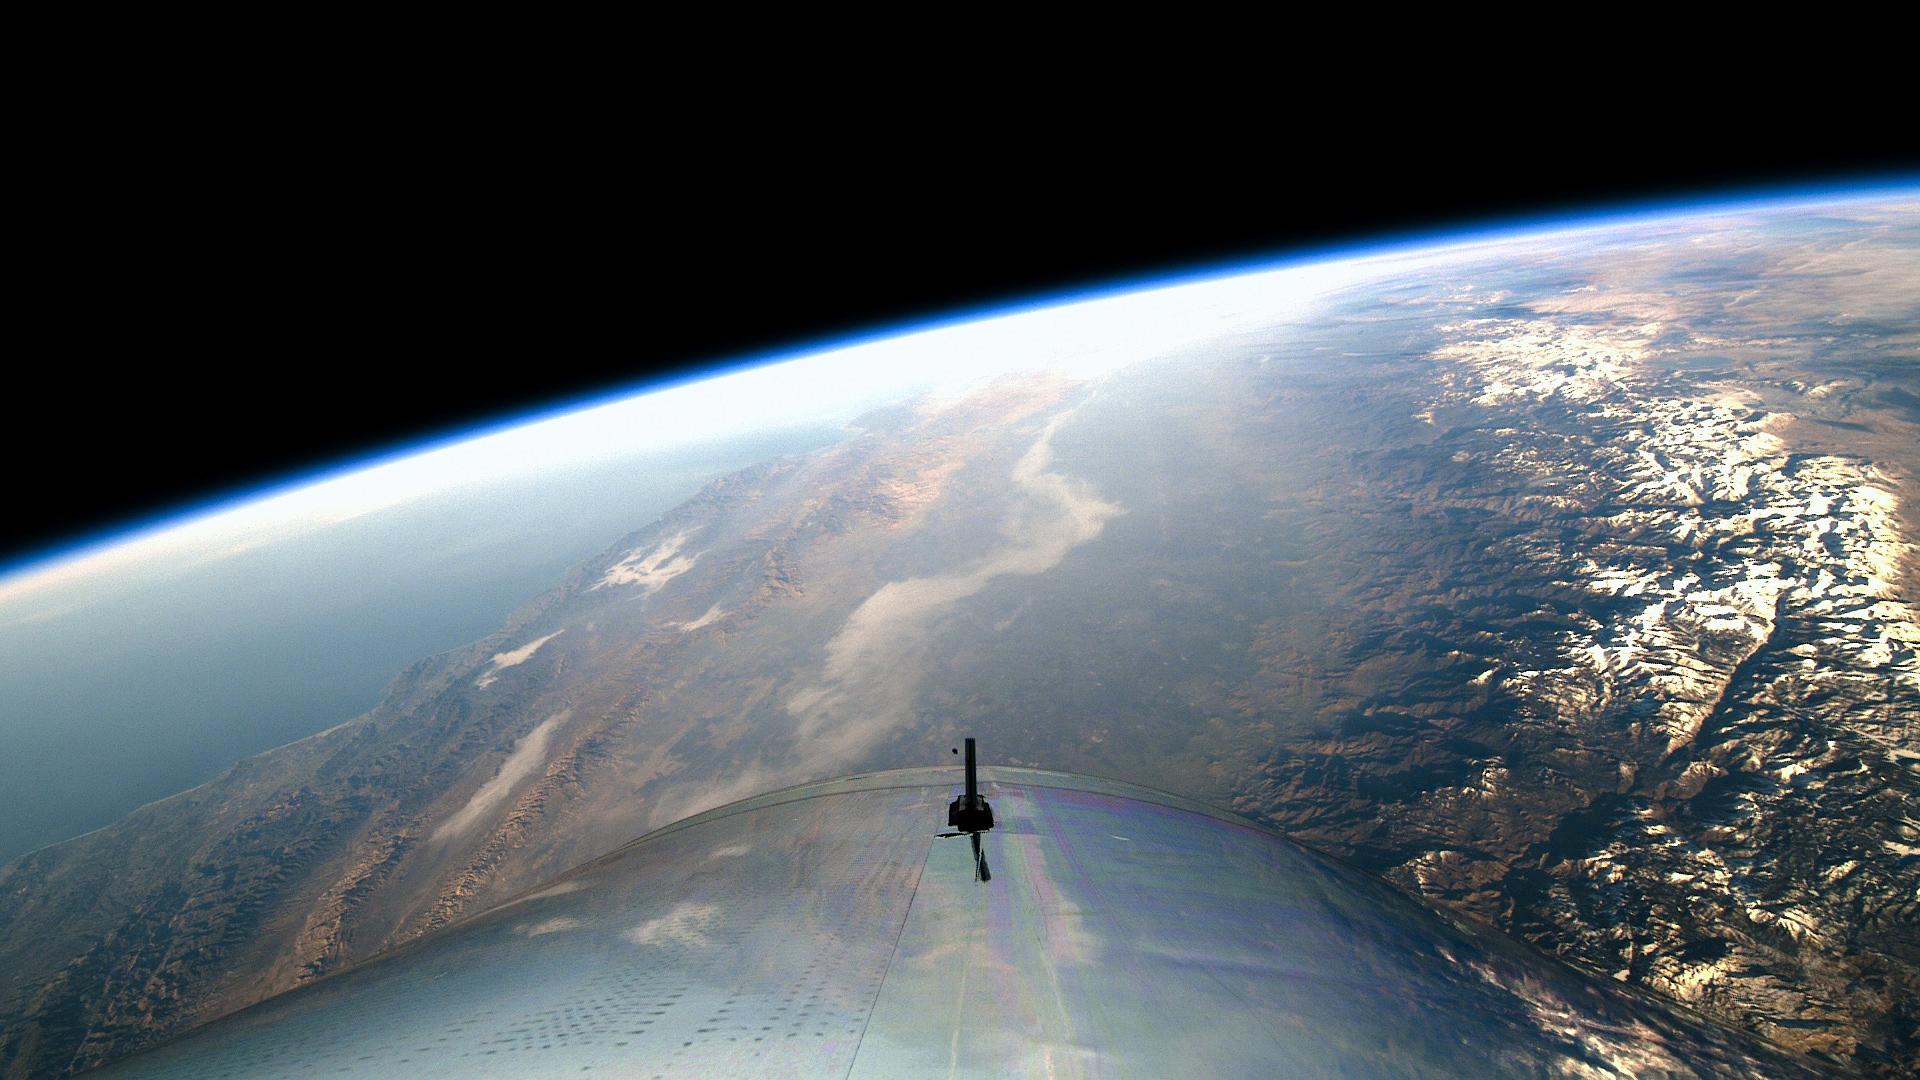 Virgin Galactic VSS Unity first spaceflight